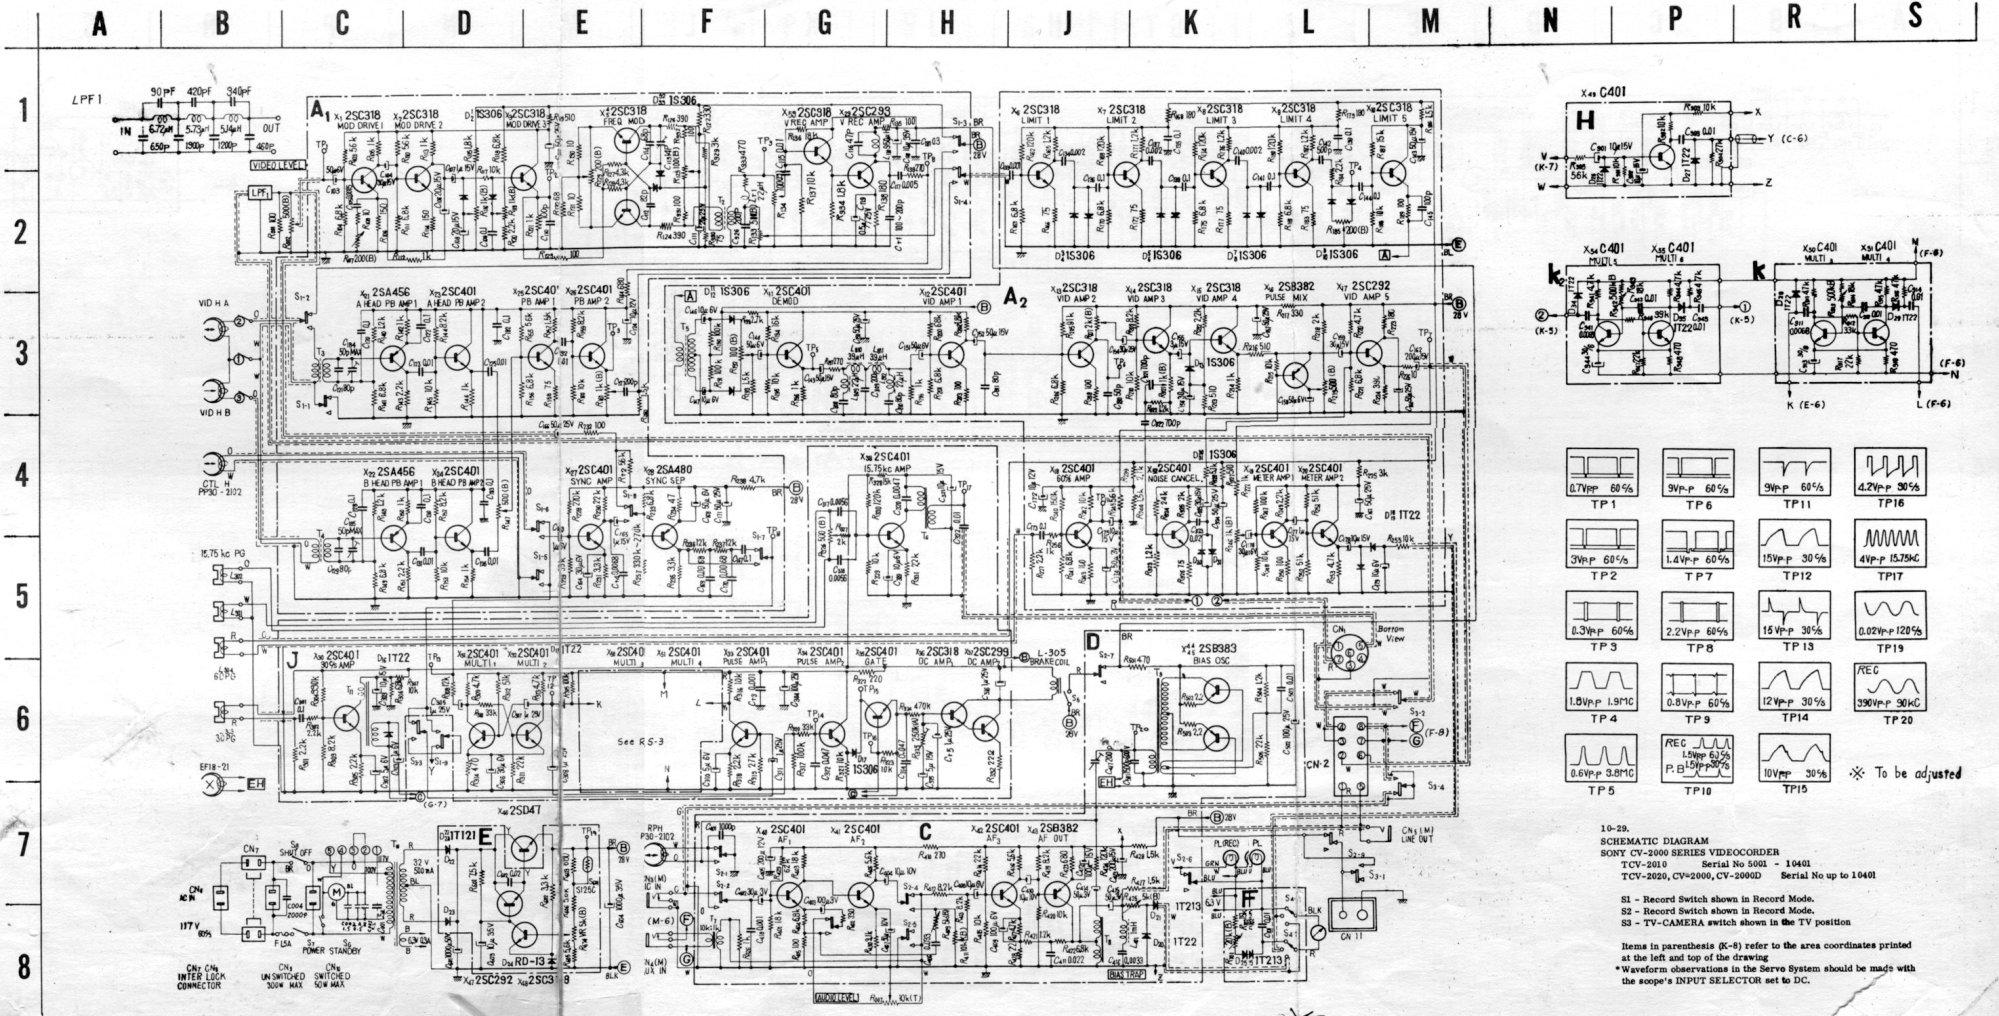 hight resolution of labguy s world sony half inch pre eiaj vtr s sony circuit diagram klv 30hr3 schematic of